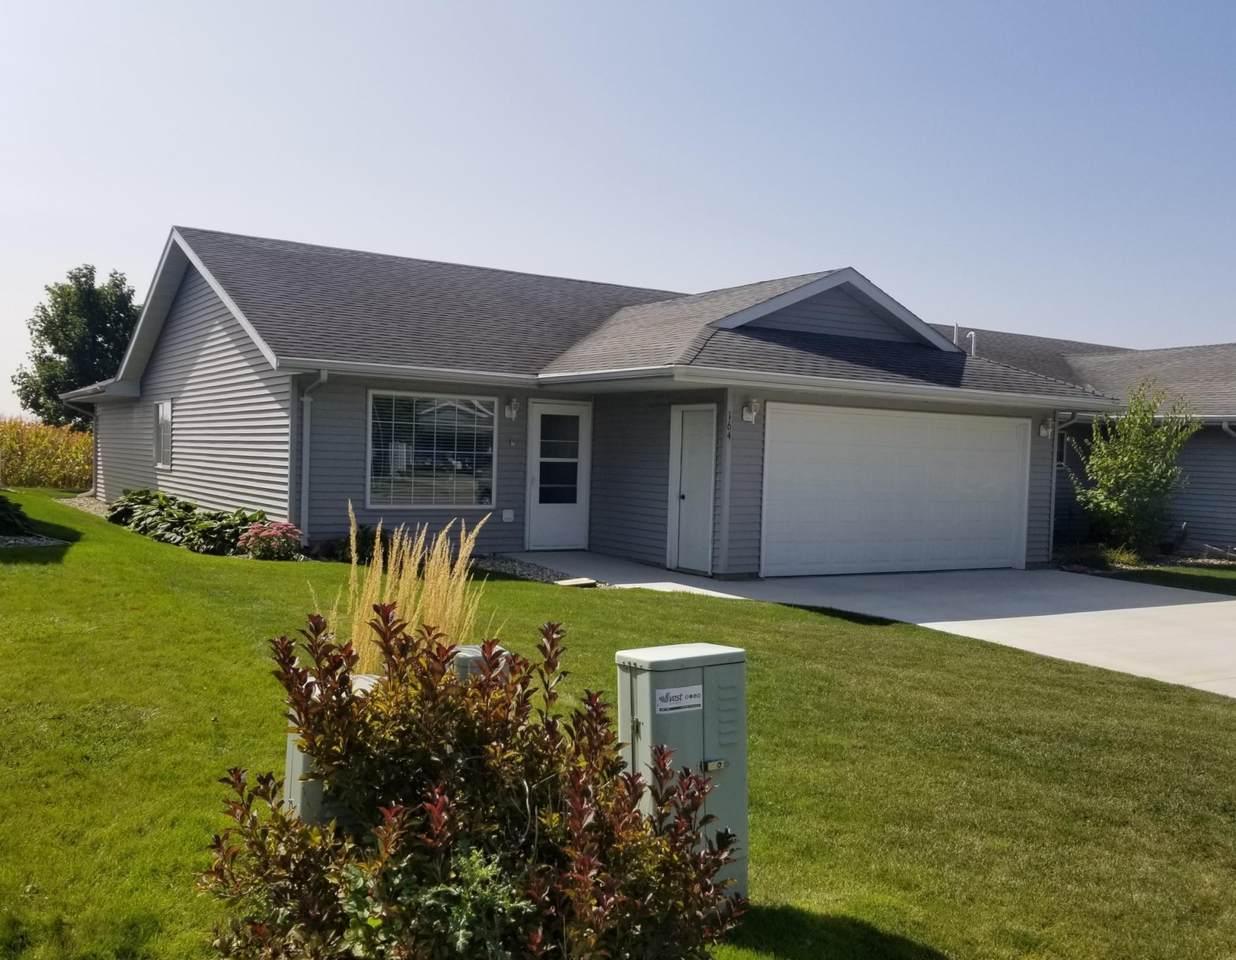 164 Ridgeview Drive - Photo 1